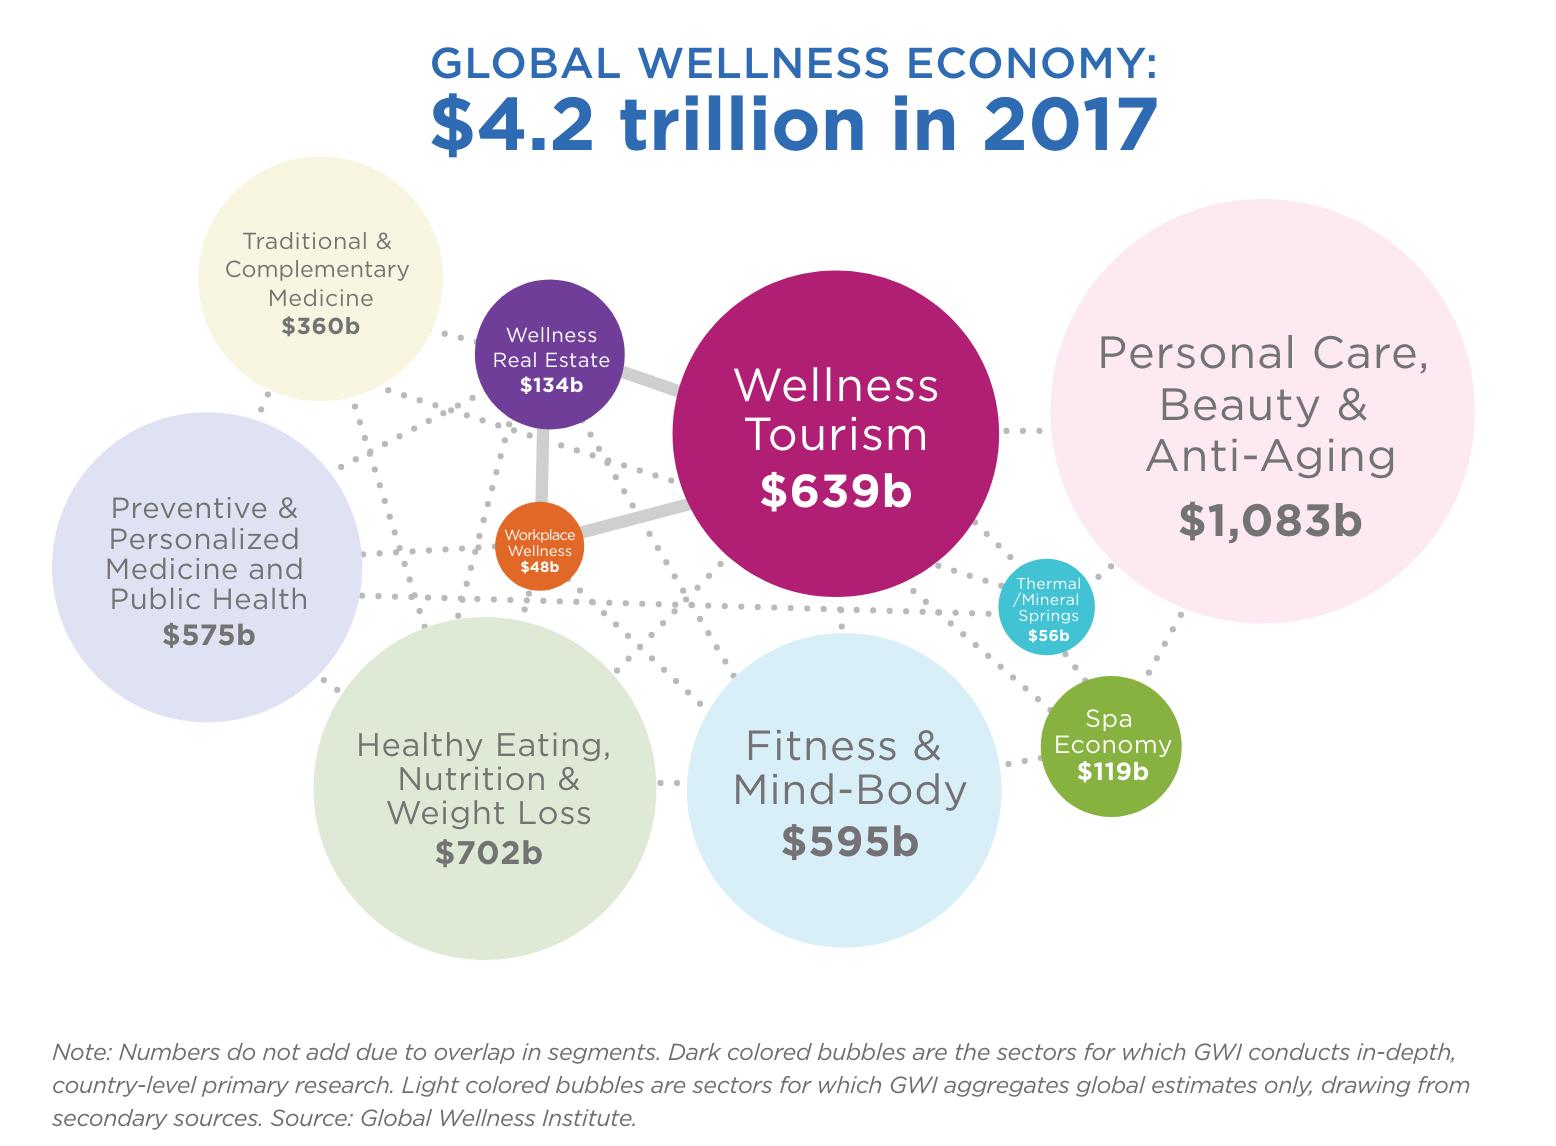 Global Wellness Institute